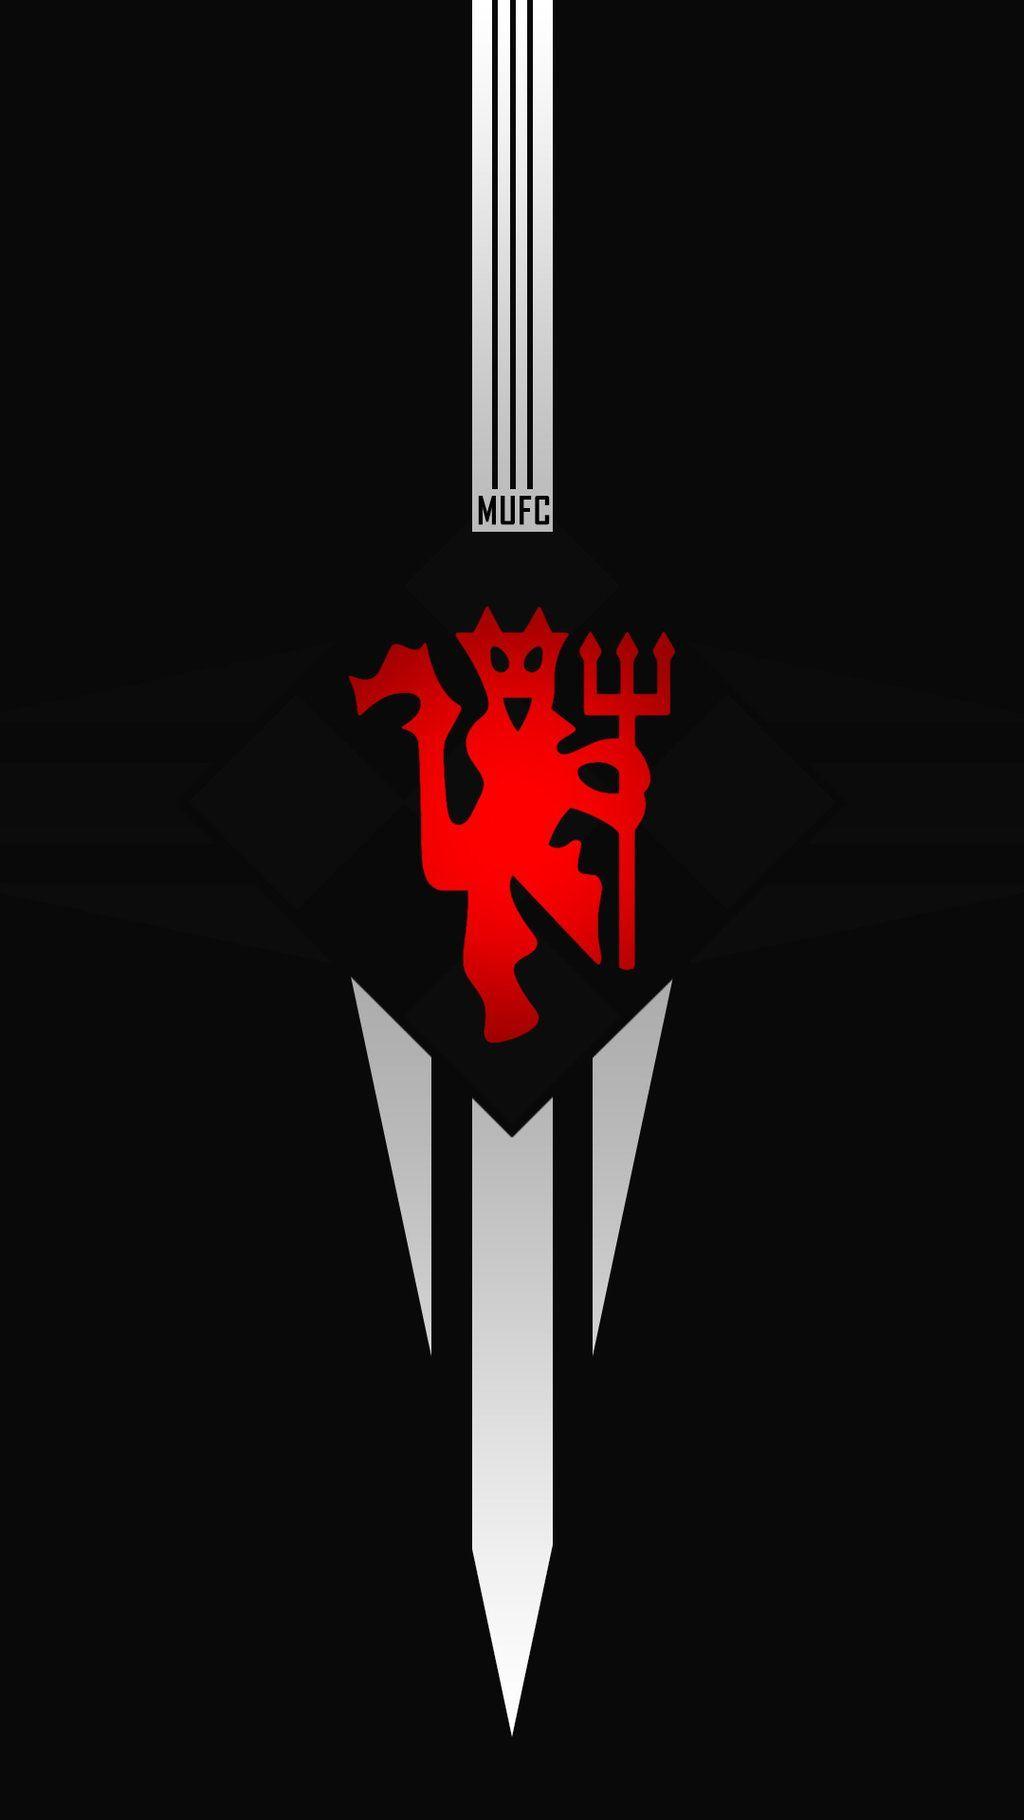 Image Result For Man Utd Wallpaper แมนเชสเตอร ย ไนเต ด คร สเต ยโน โรน ลโด ไอเด ยรอยส ก